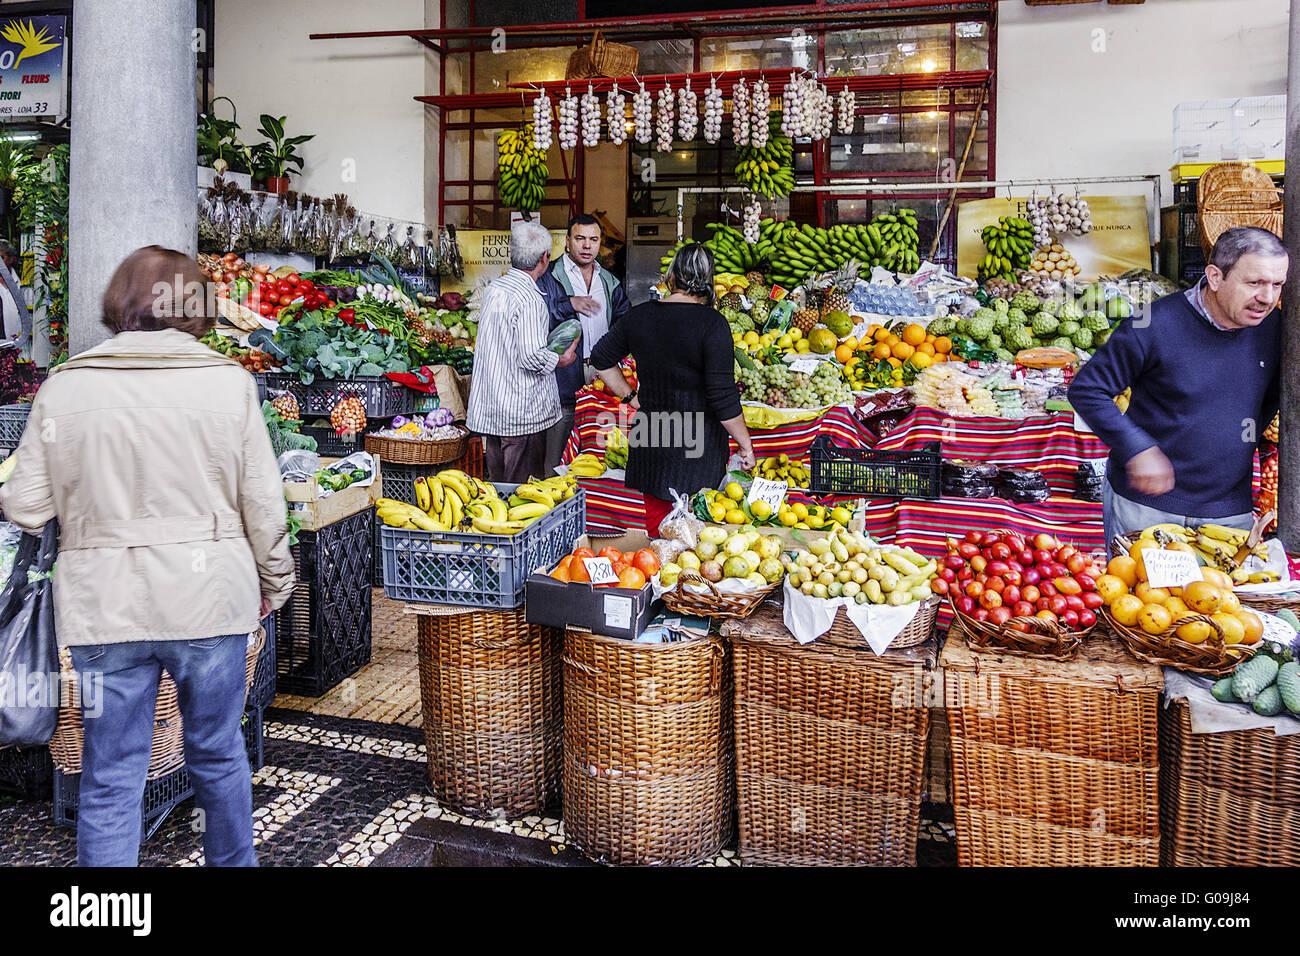 Fruit and Veg Market Funchal Madeira Portugal - Stock Image